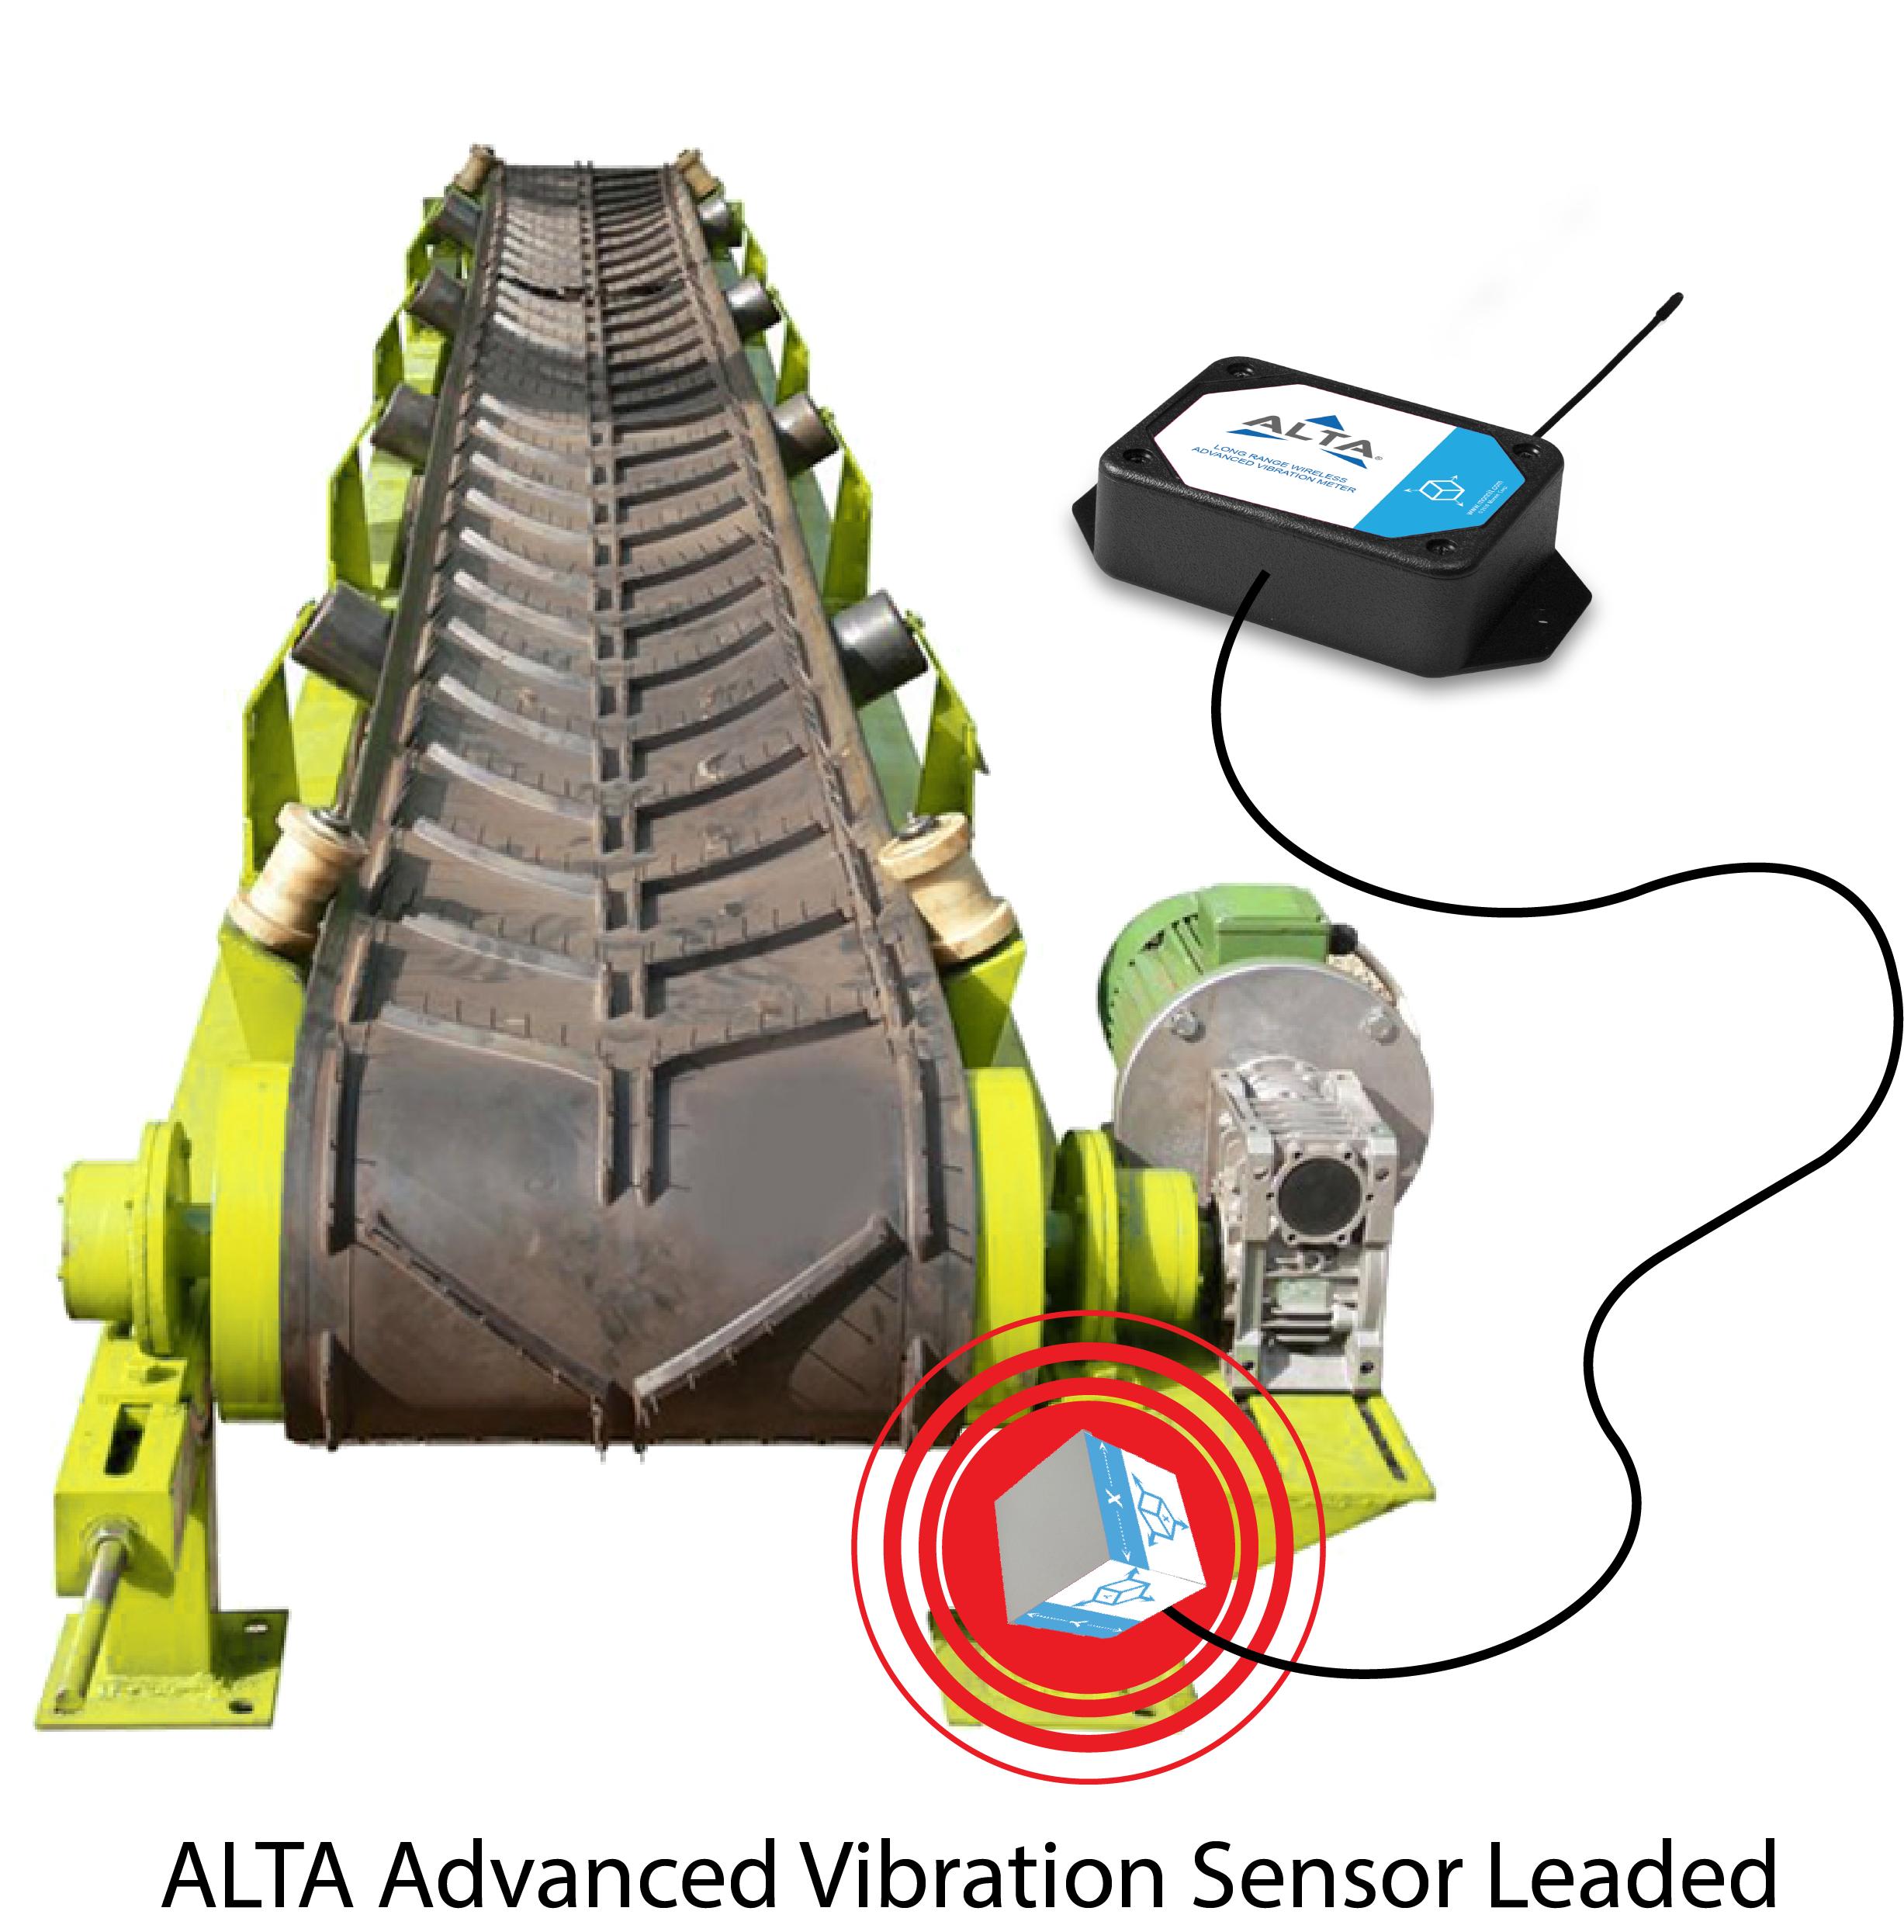 ALTA Advanced Vibration AA Leaded Sensor in use on a converyer